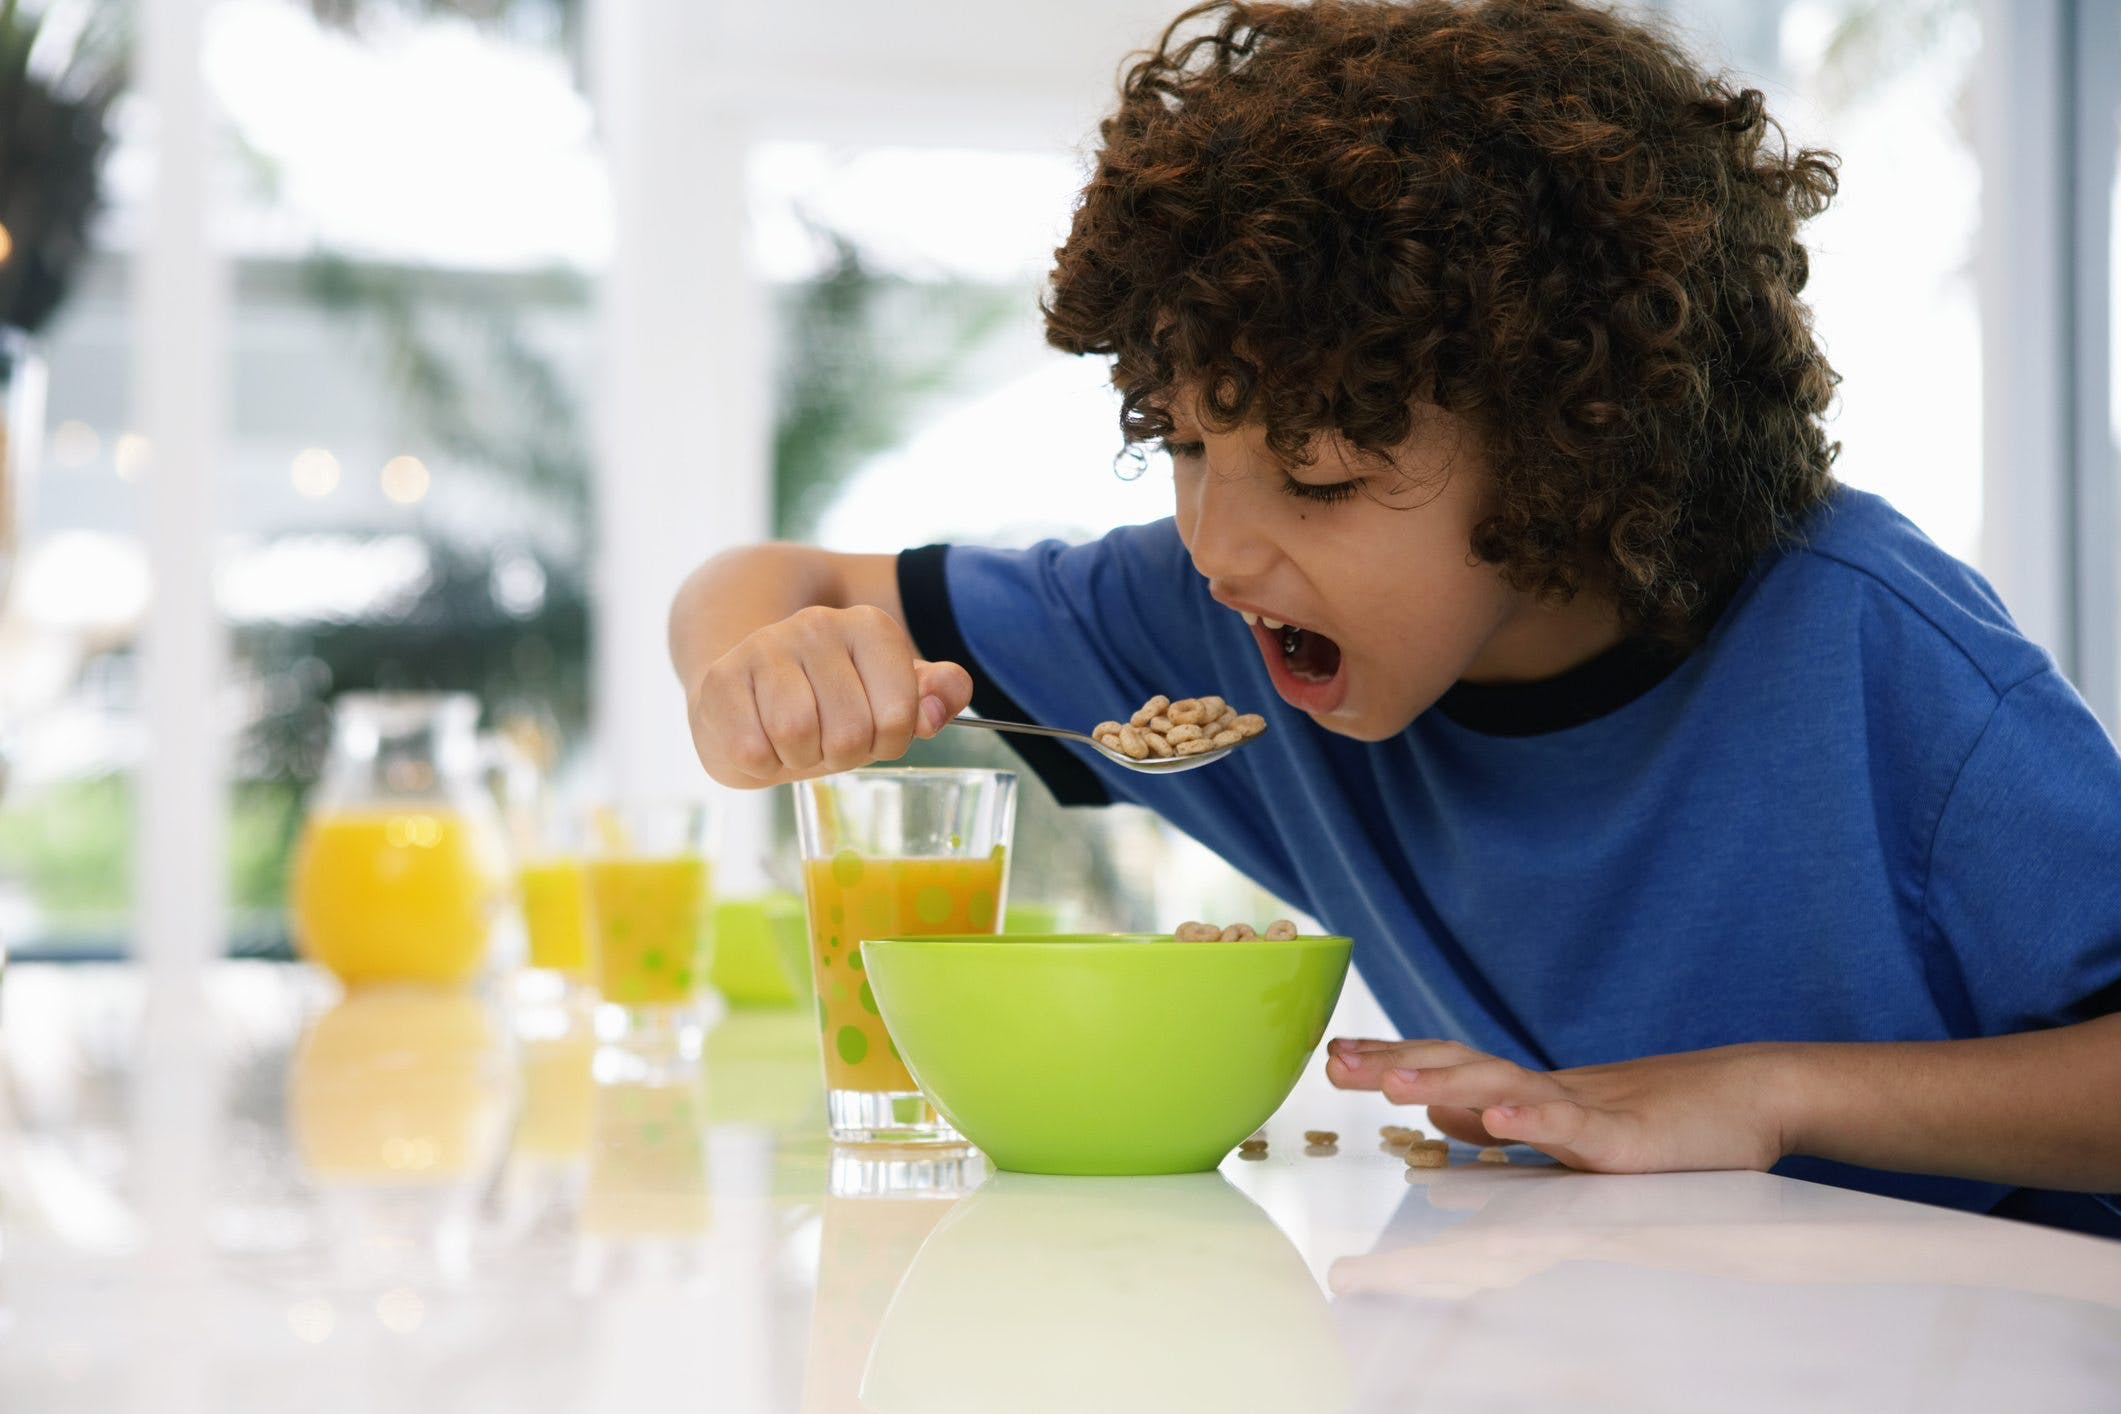 Tackling Australia's Obesity Problem by Cutting Sugar in Half